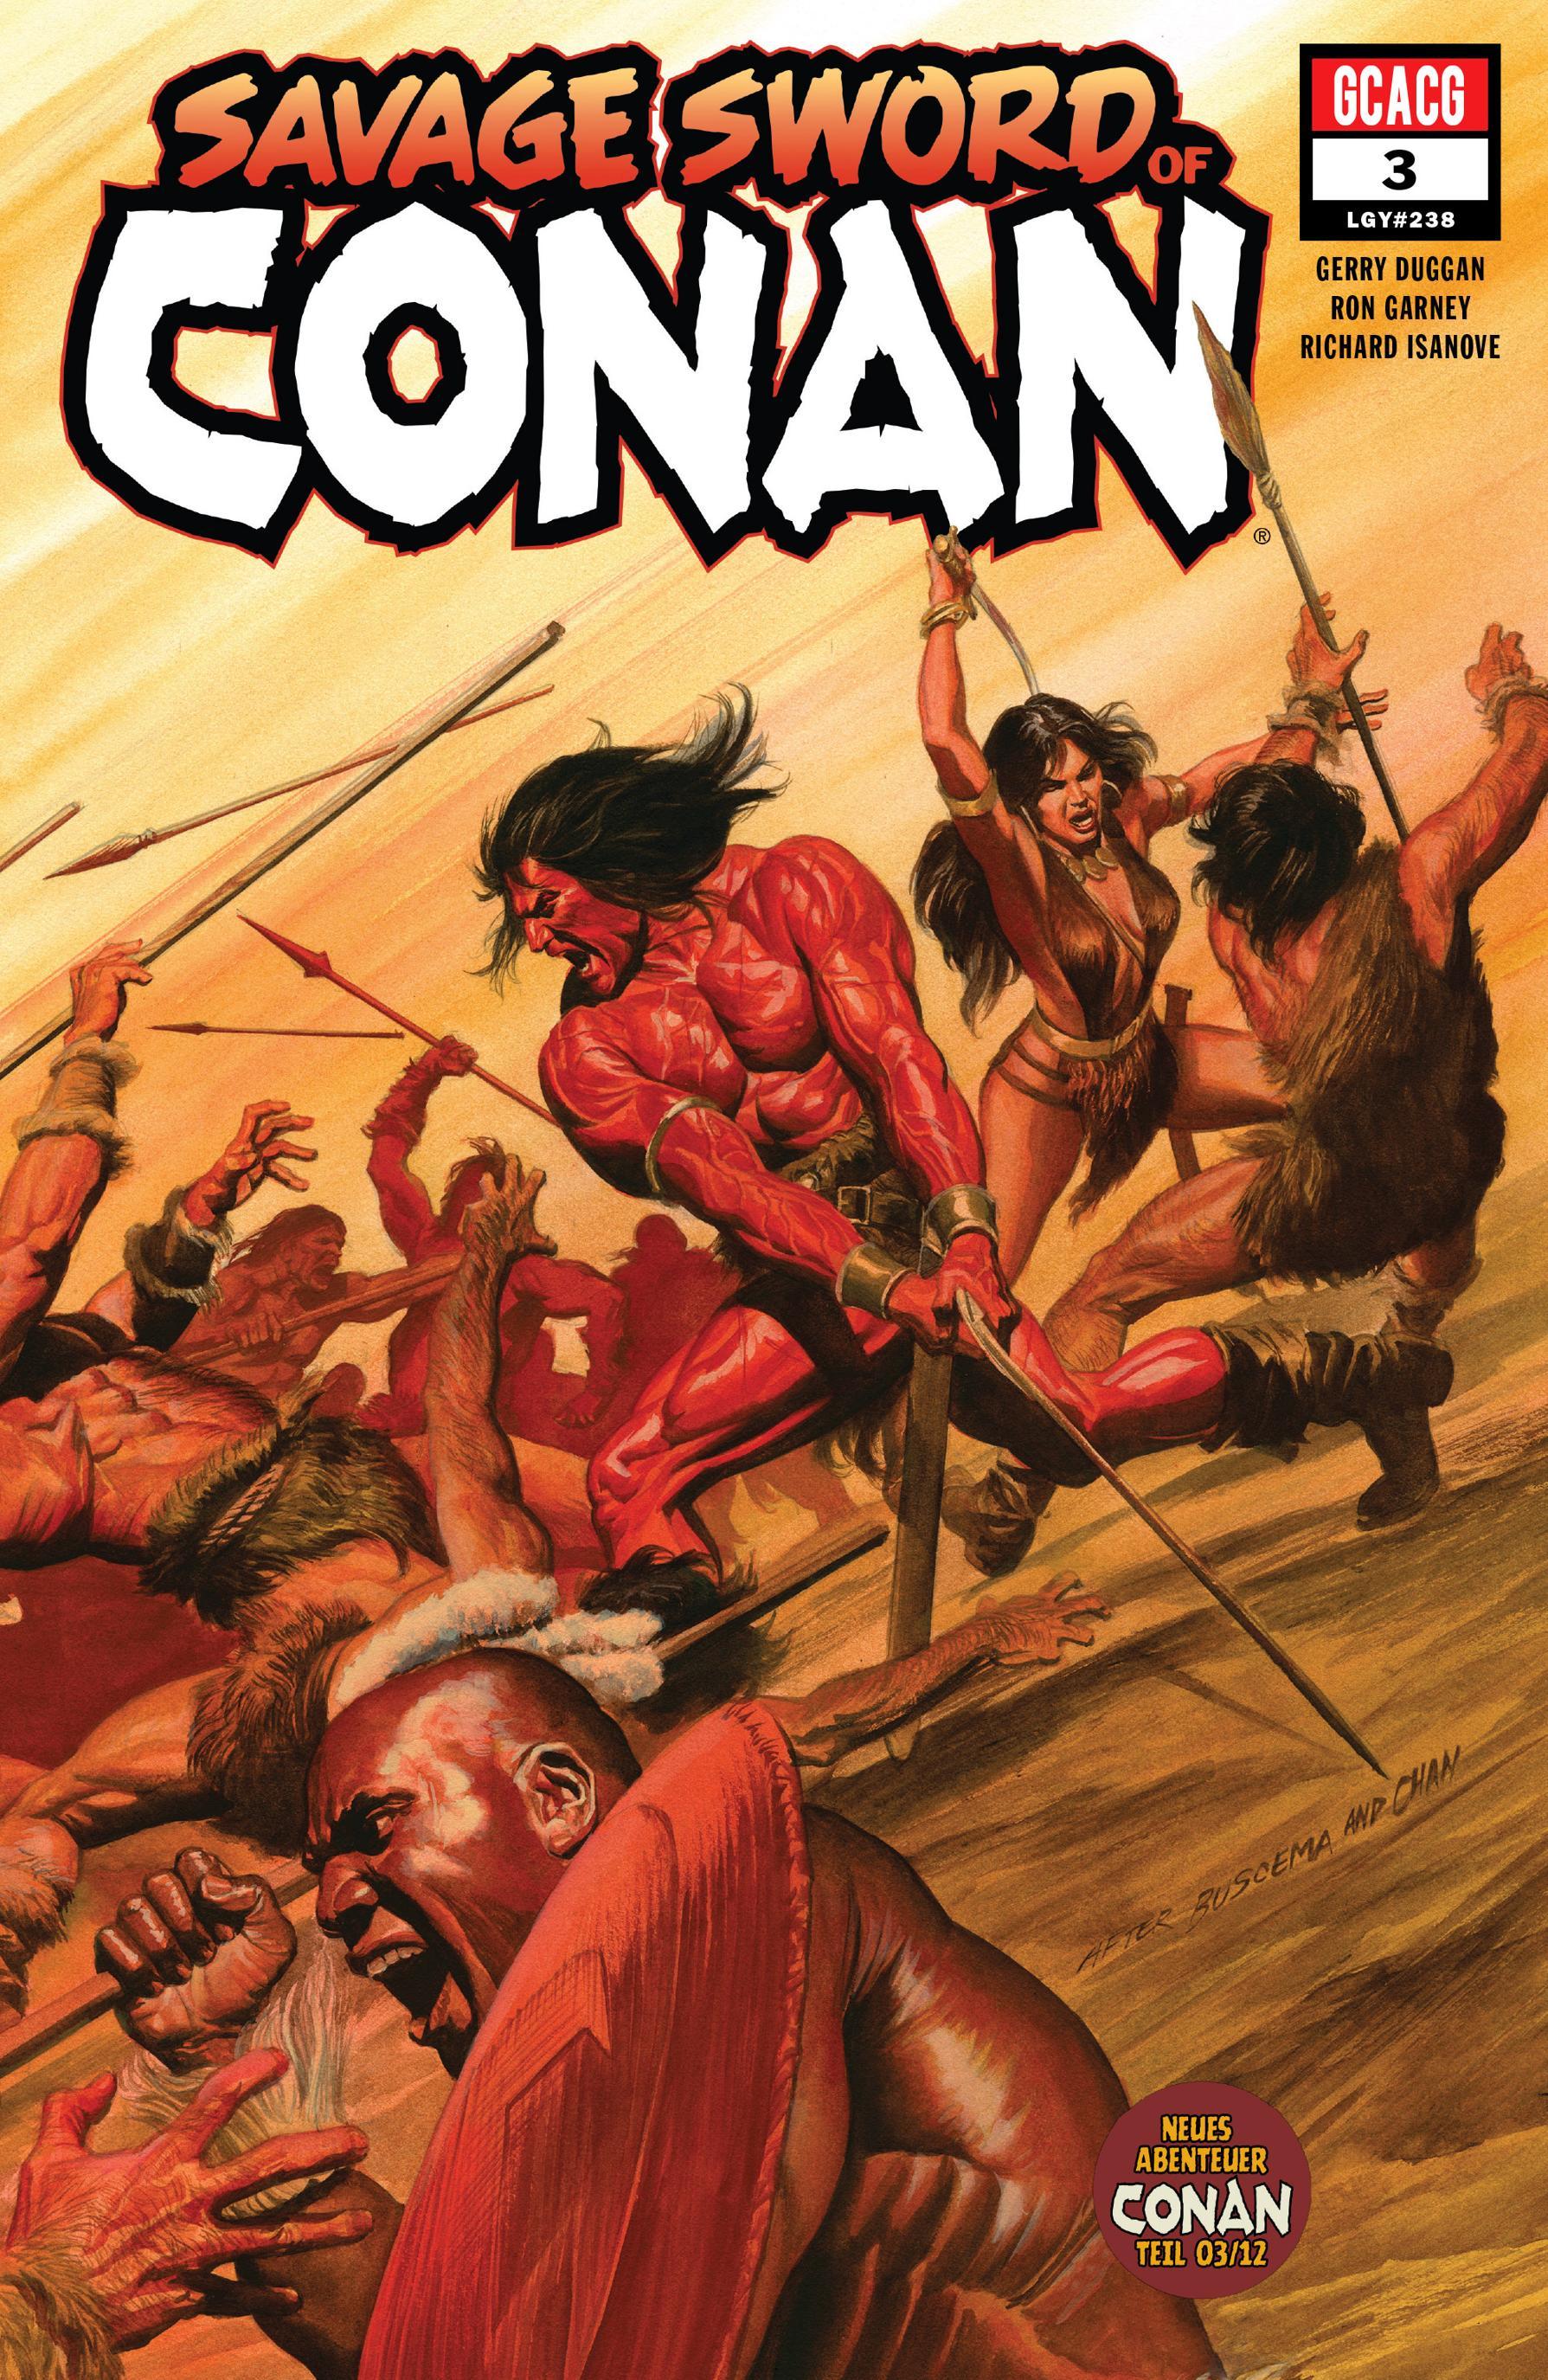 Savage Sword Of Conan 003 - Der Kult des Koga Thun 03 (2019) (Scanlation #738) (2019)